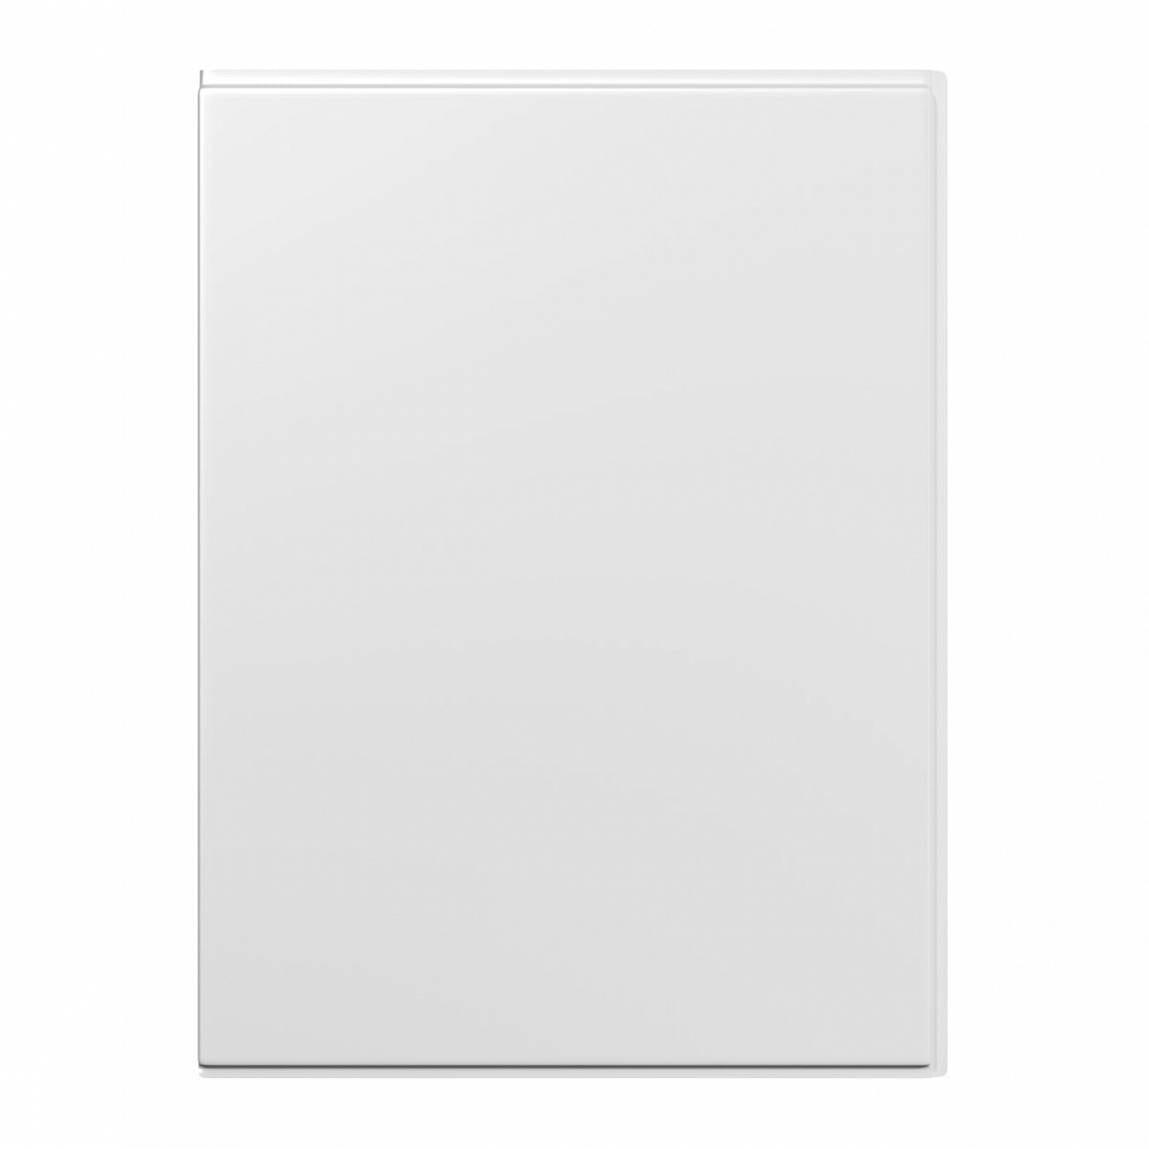 Acrylic bath end panel 750mm